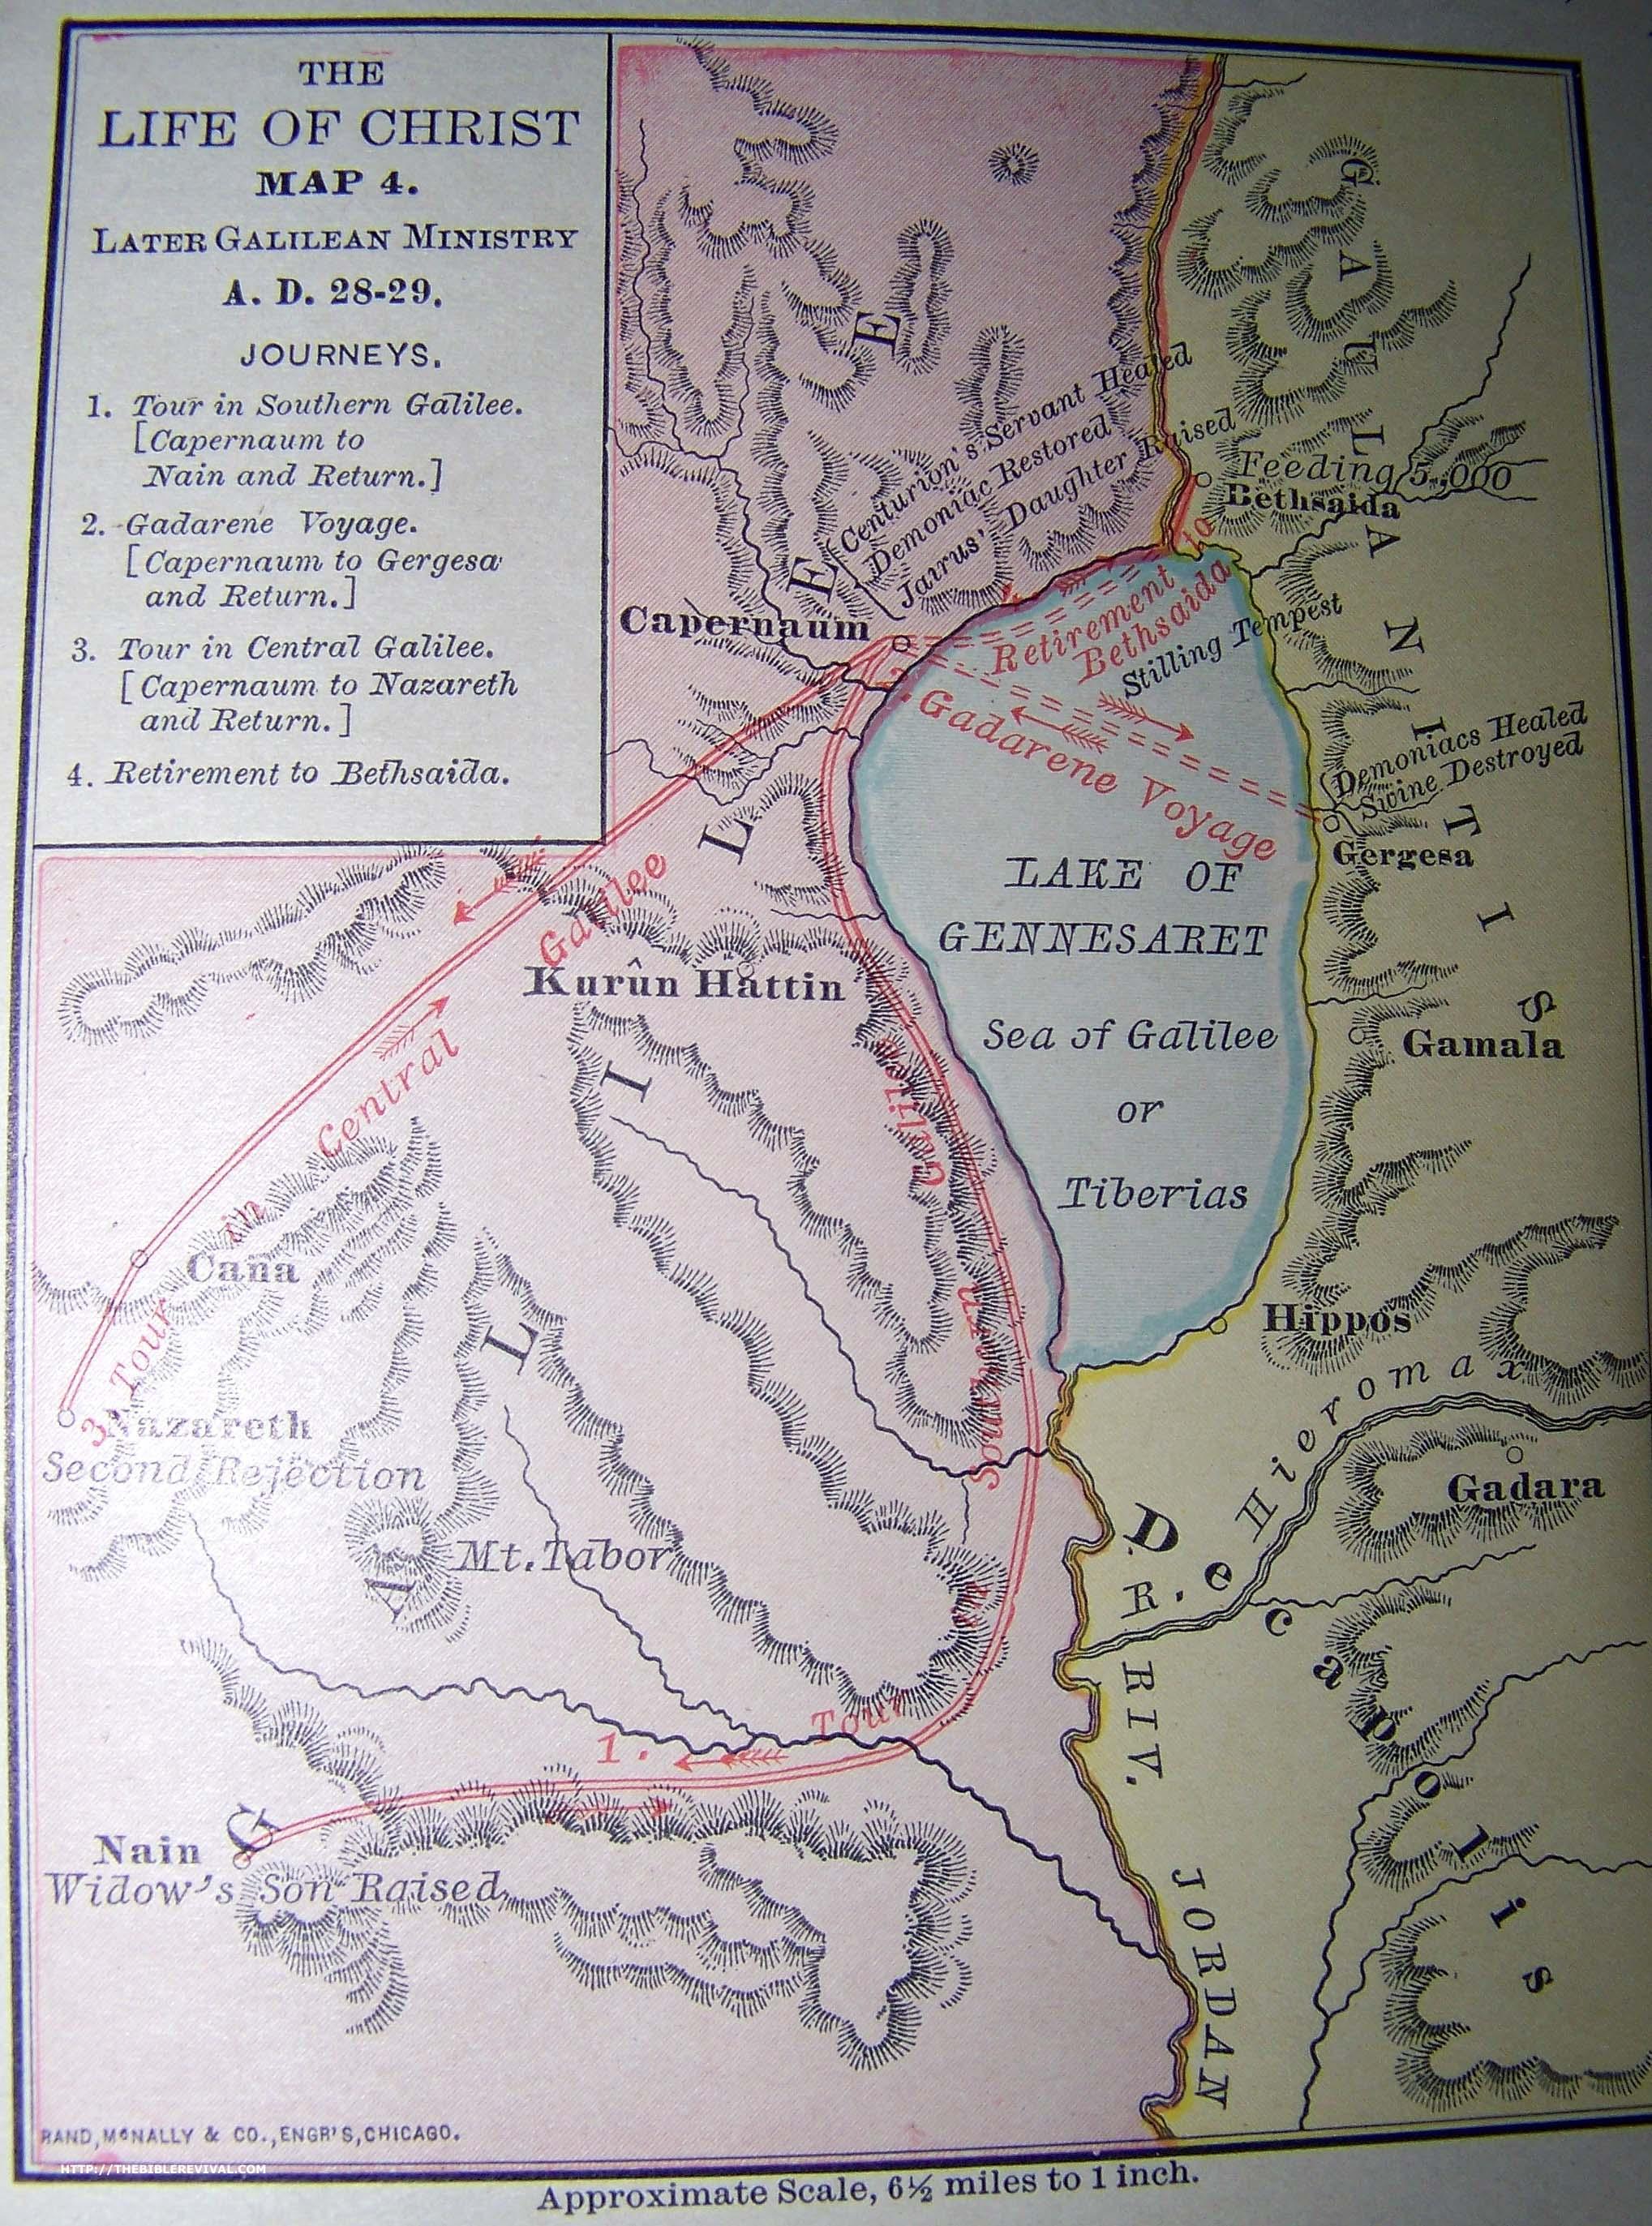 Maps, Charts, Customs - THE BIBLE WAY